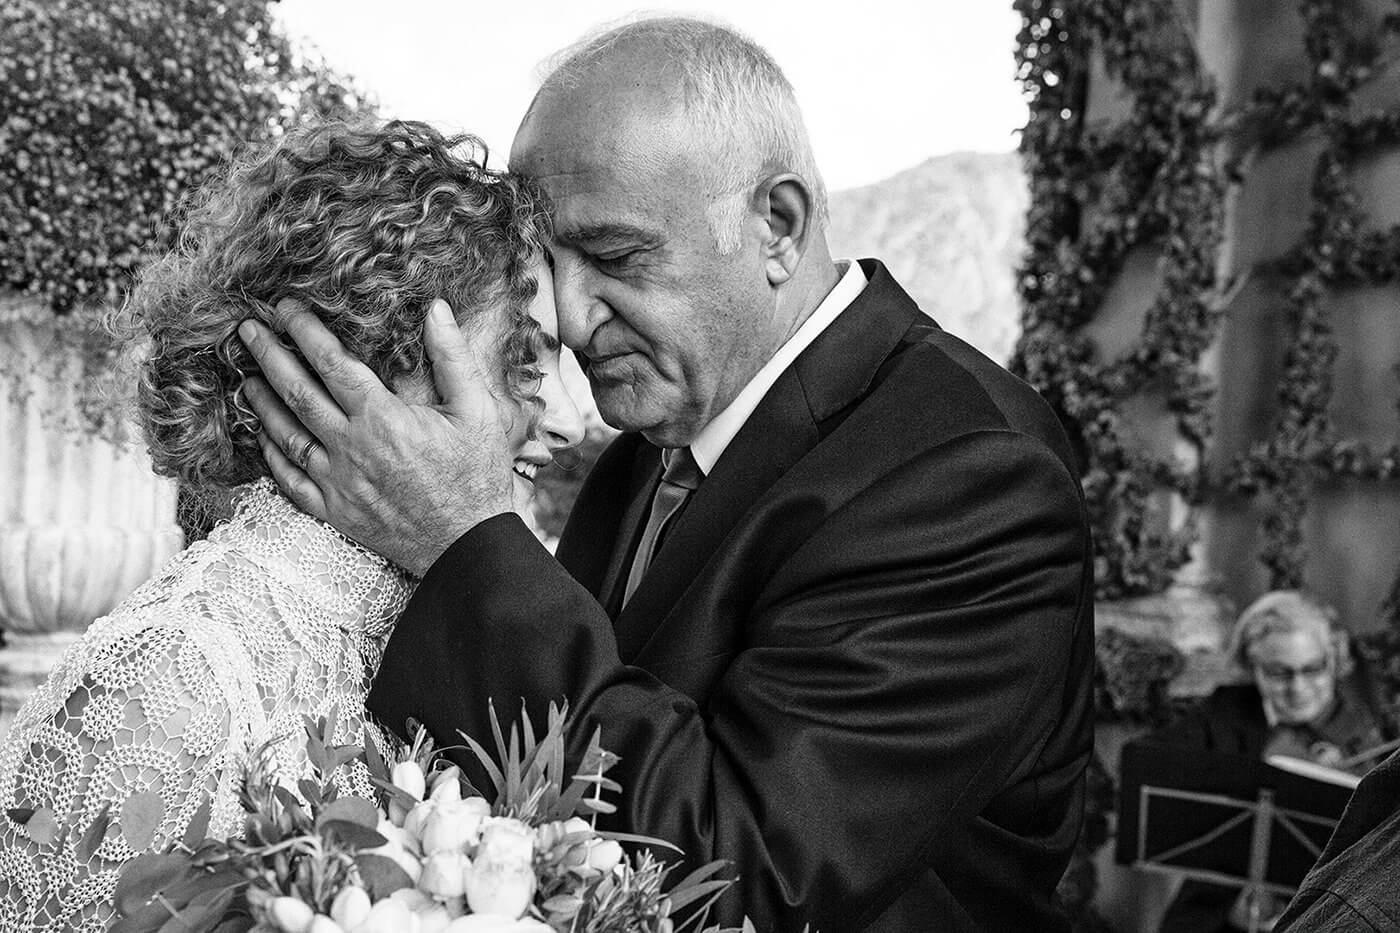 Wedding Photographer Siena - Duccio Argentini